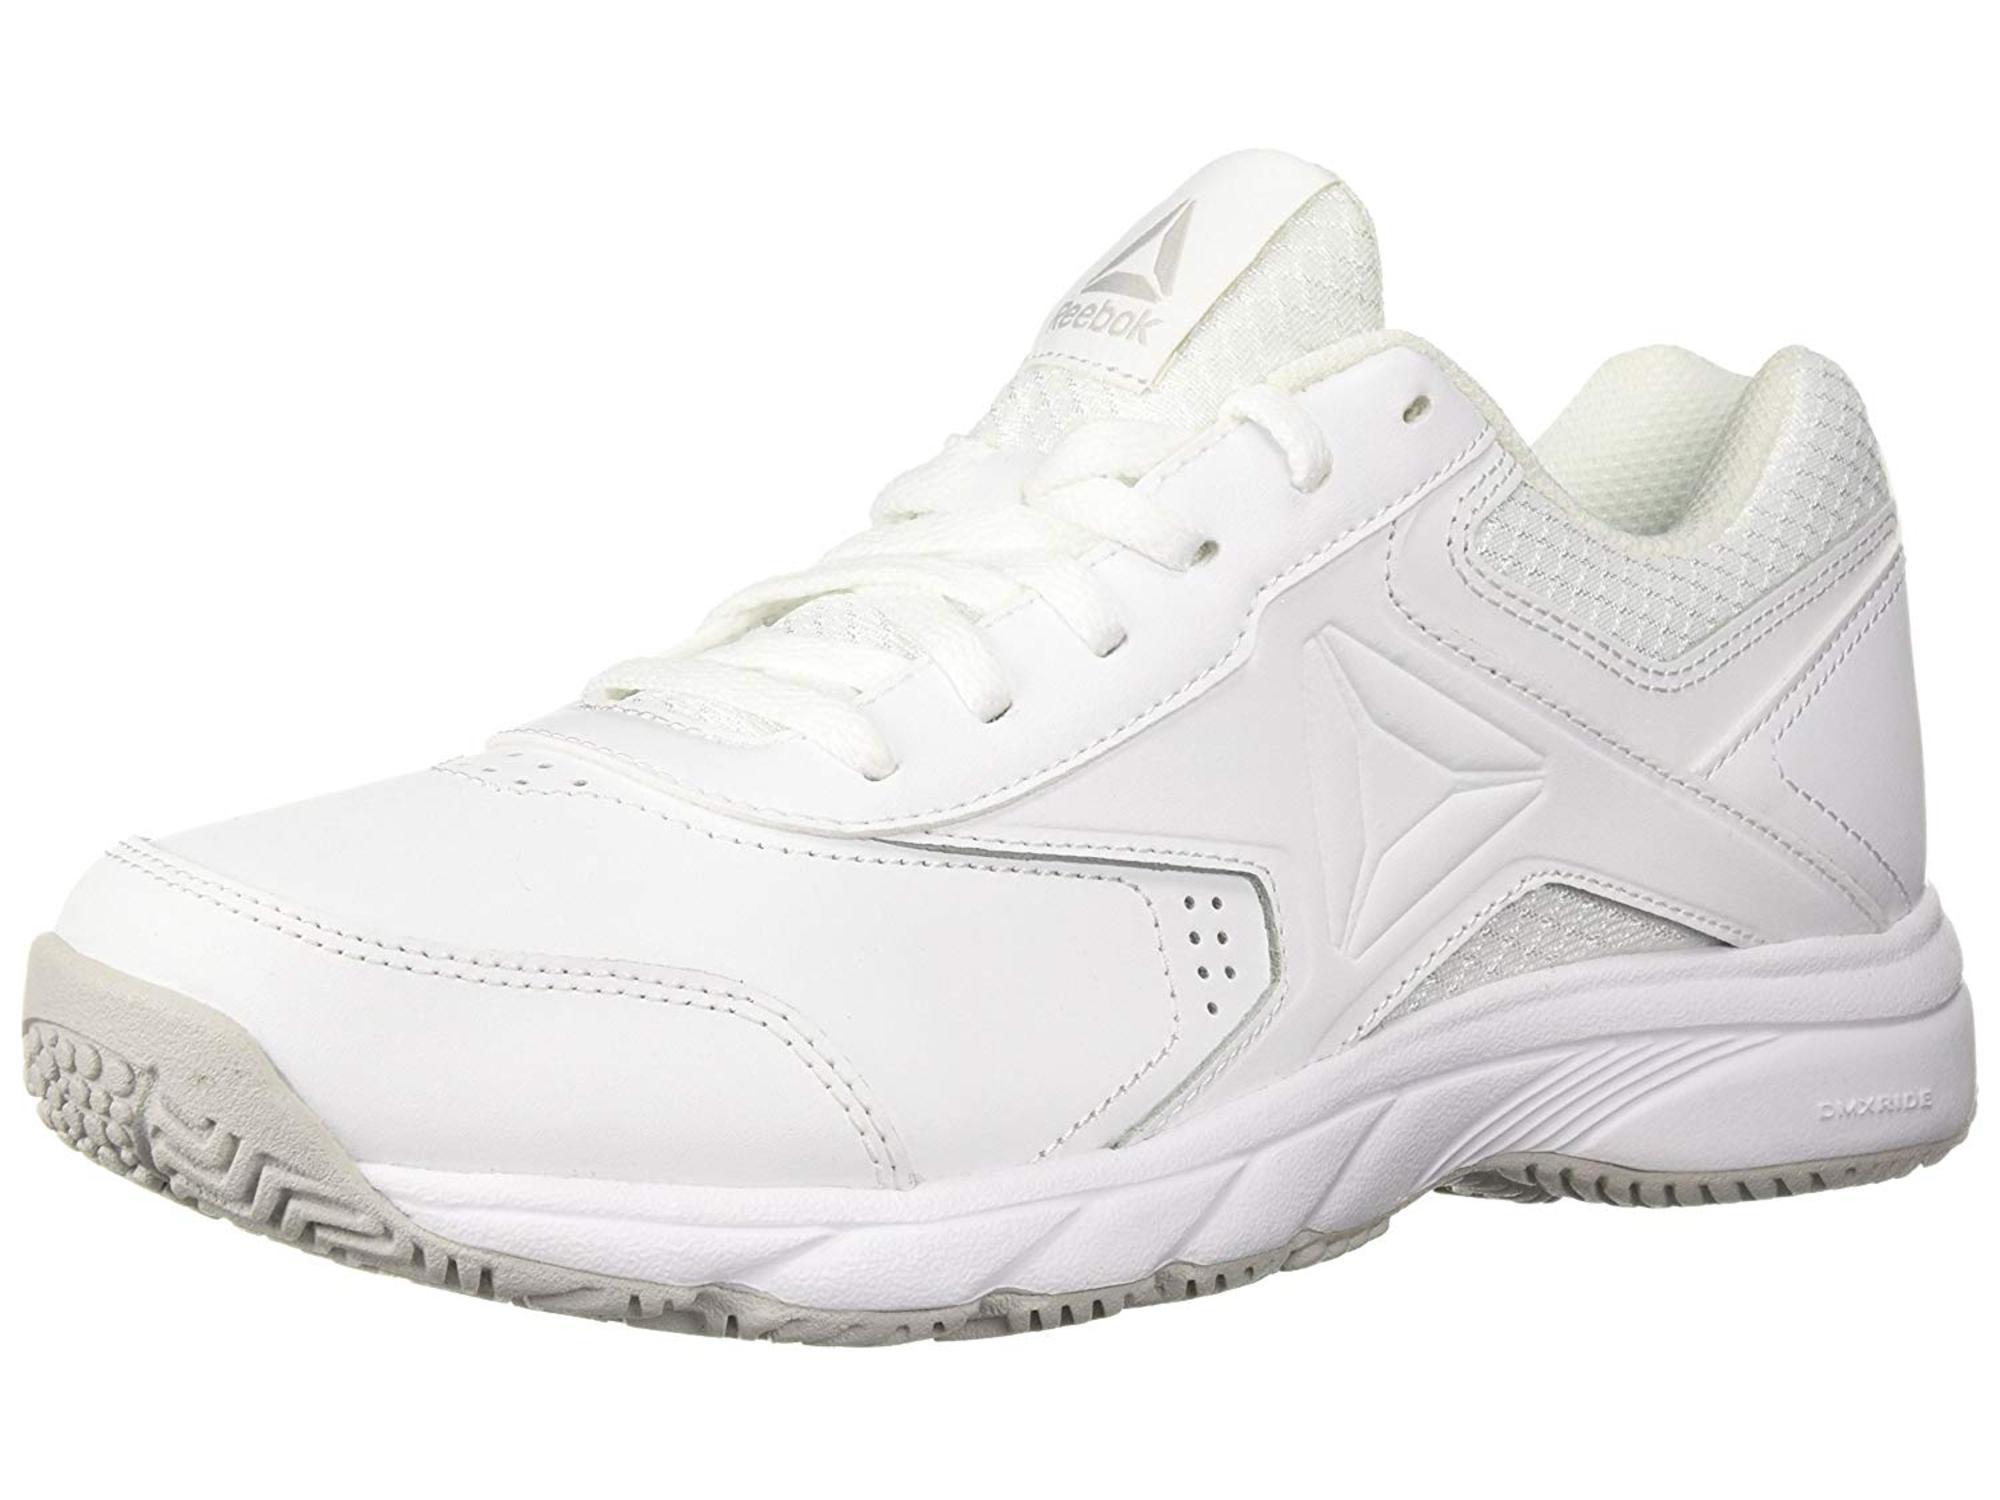 Reebok Women's Work N Cushion 3.0 Walking Shoe, White/Steel_whi, Size 10.5